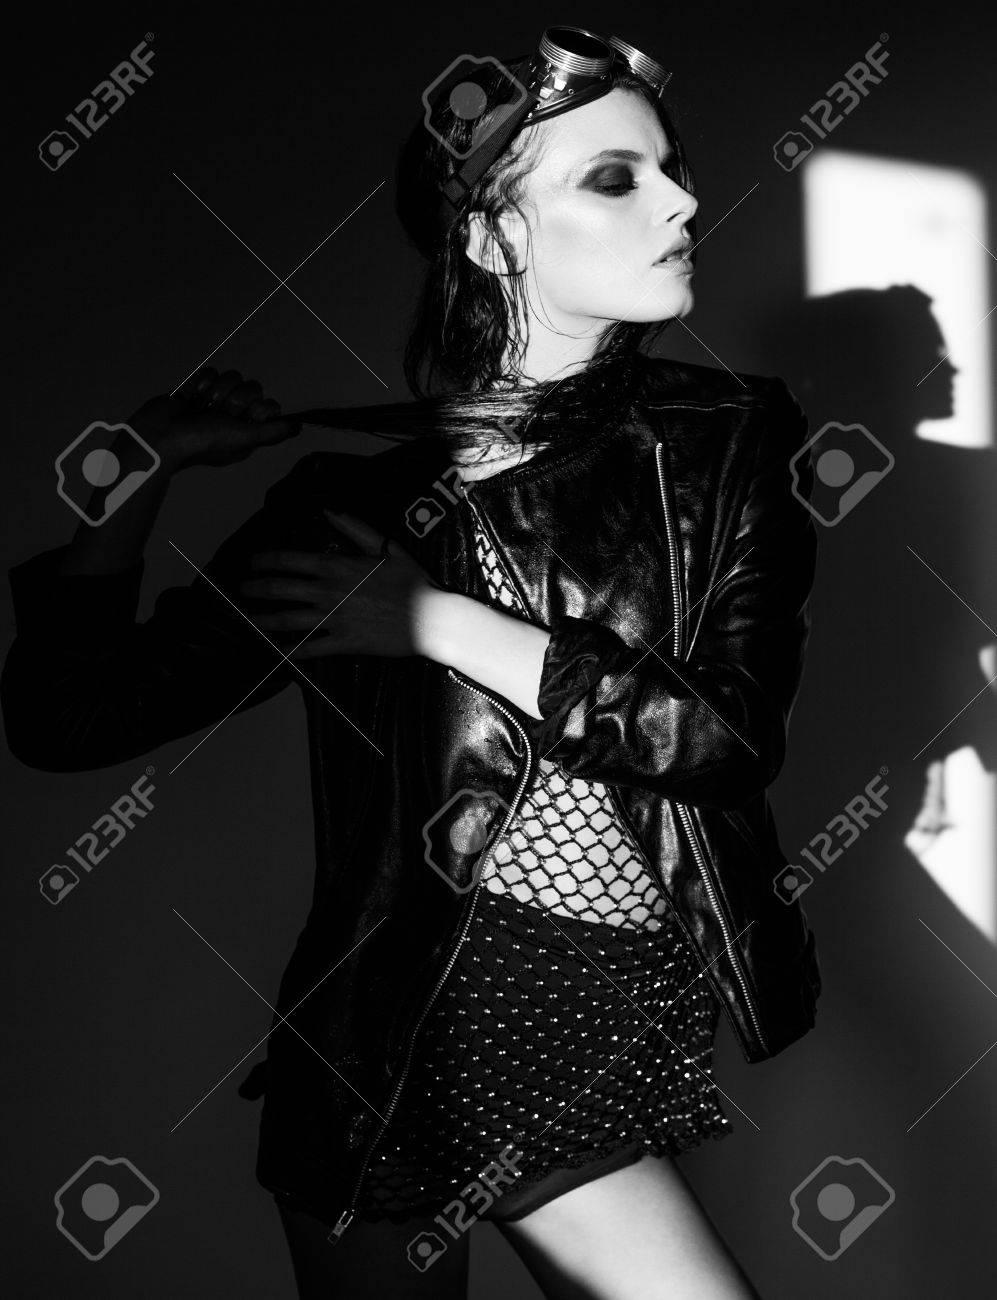 90b923700 Foto de archivo - Sexy vestido punky modelo de mujer